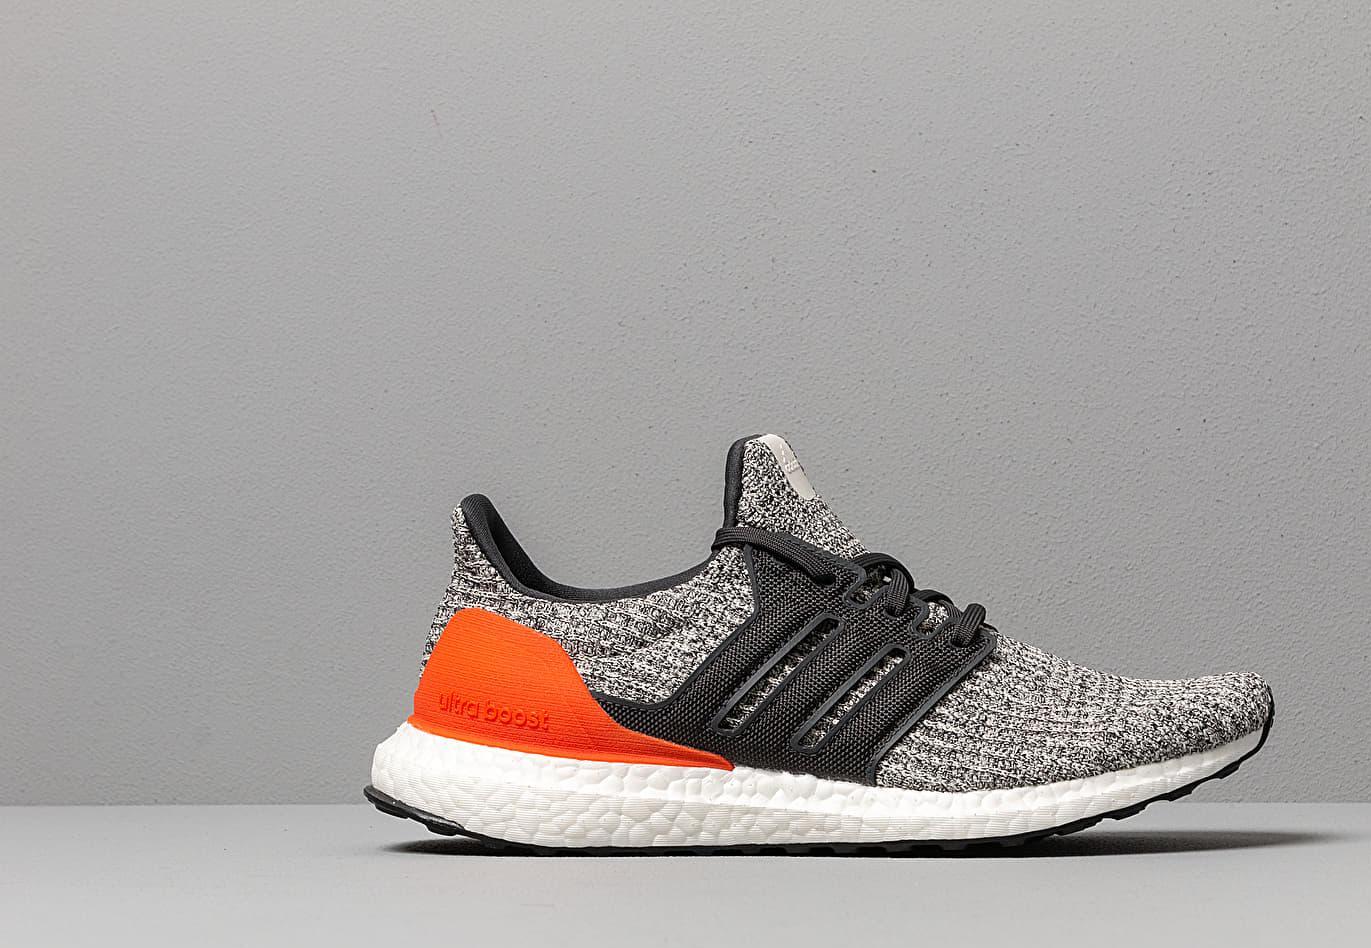 afe4e8229 Adidas Originals - Adidas Ultraboost Raw White  Carbon  Active Orange for  Men - Lyst. View fullscreen